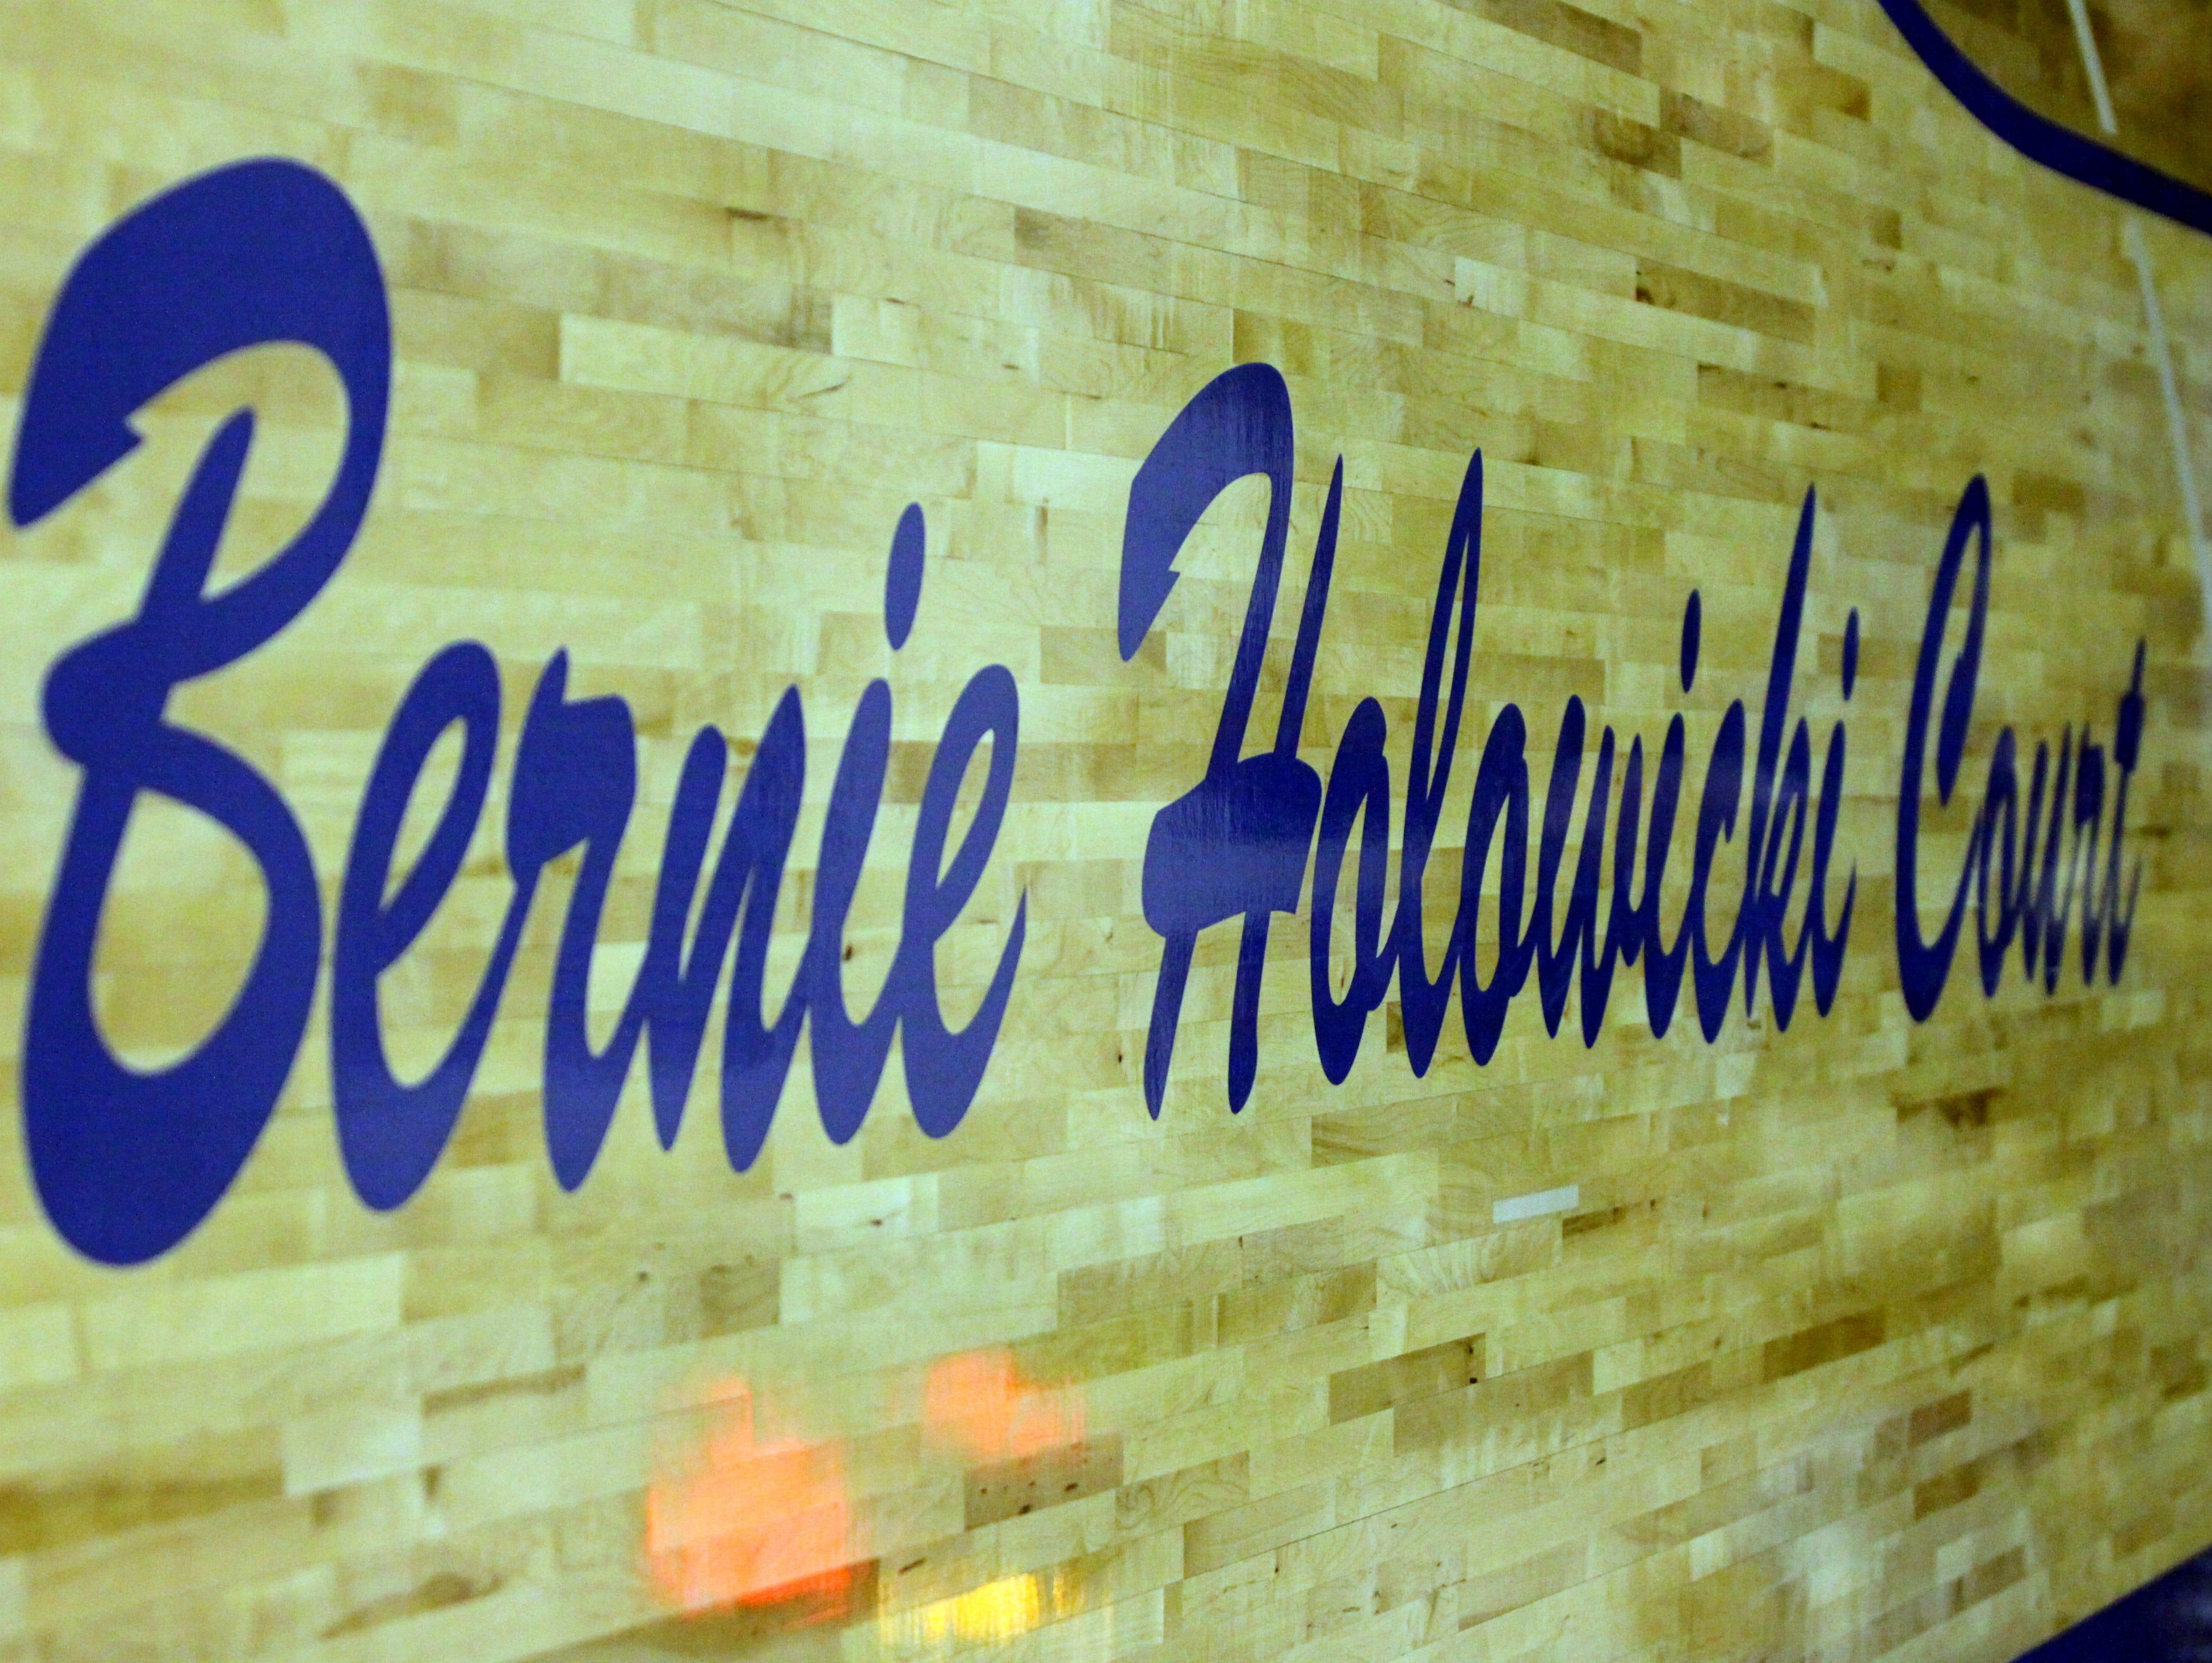 Catholic Central now cal call it Bernie Holowicki Court.